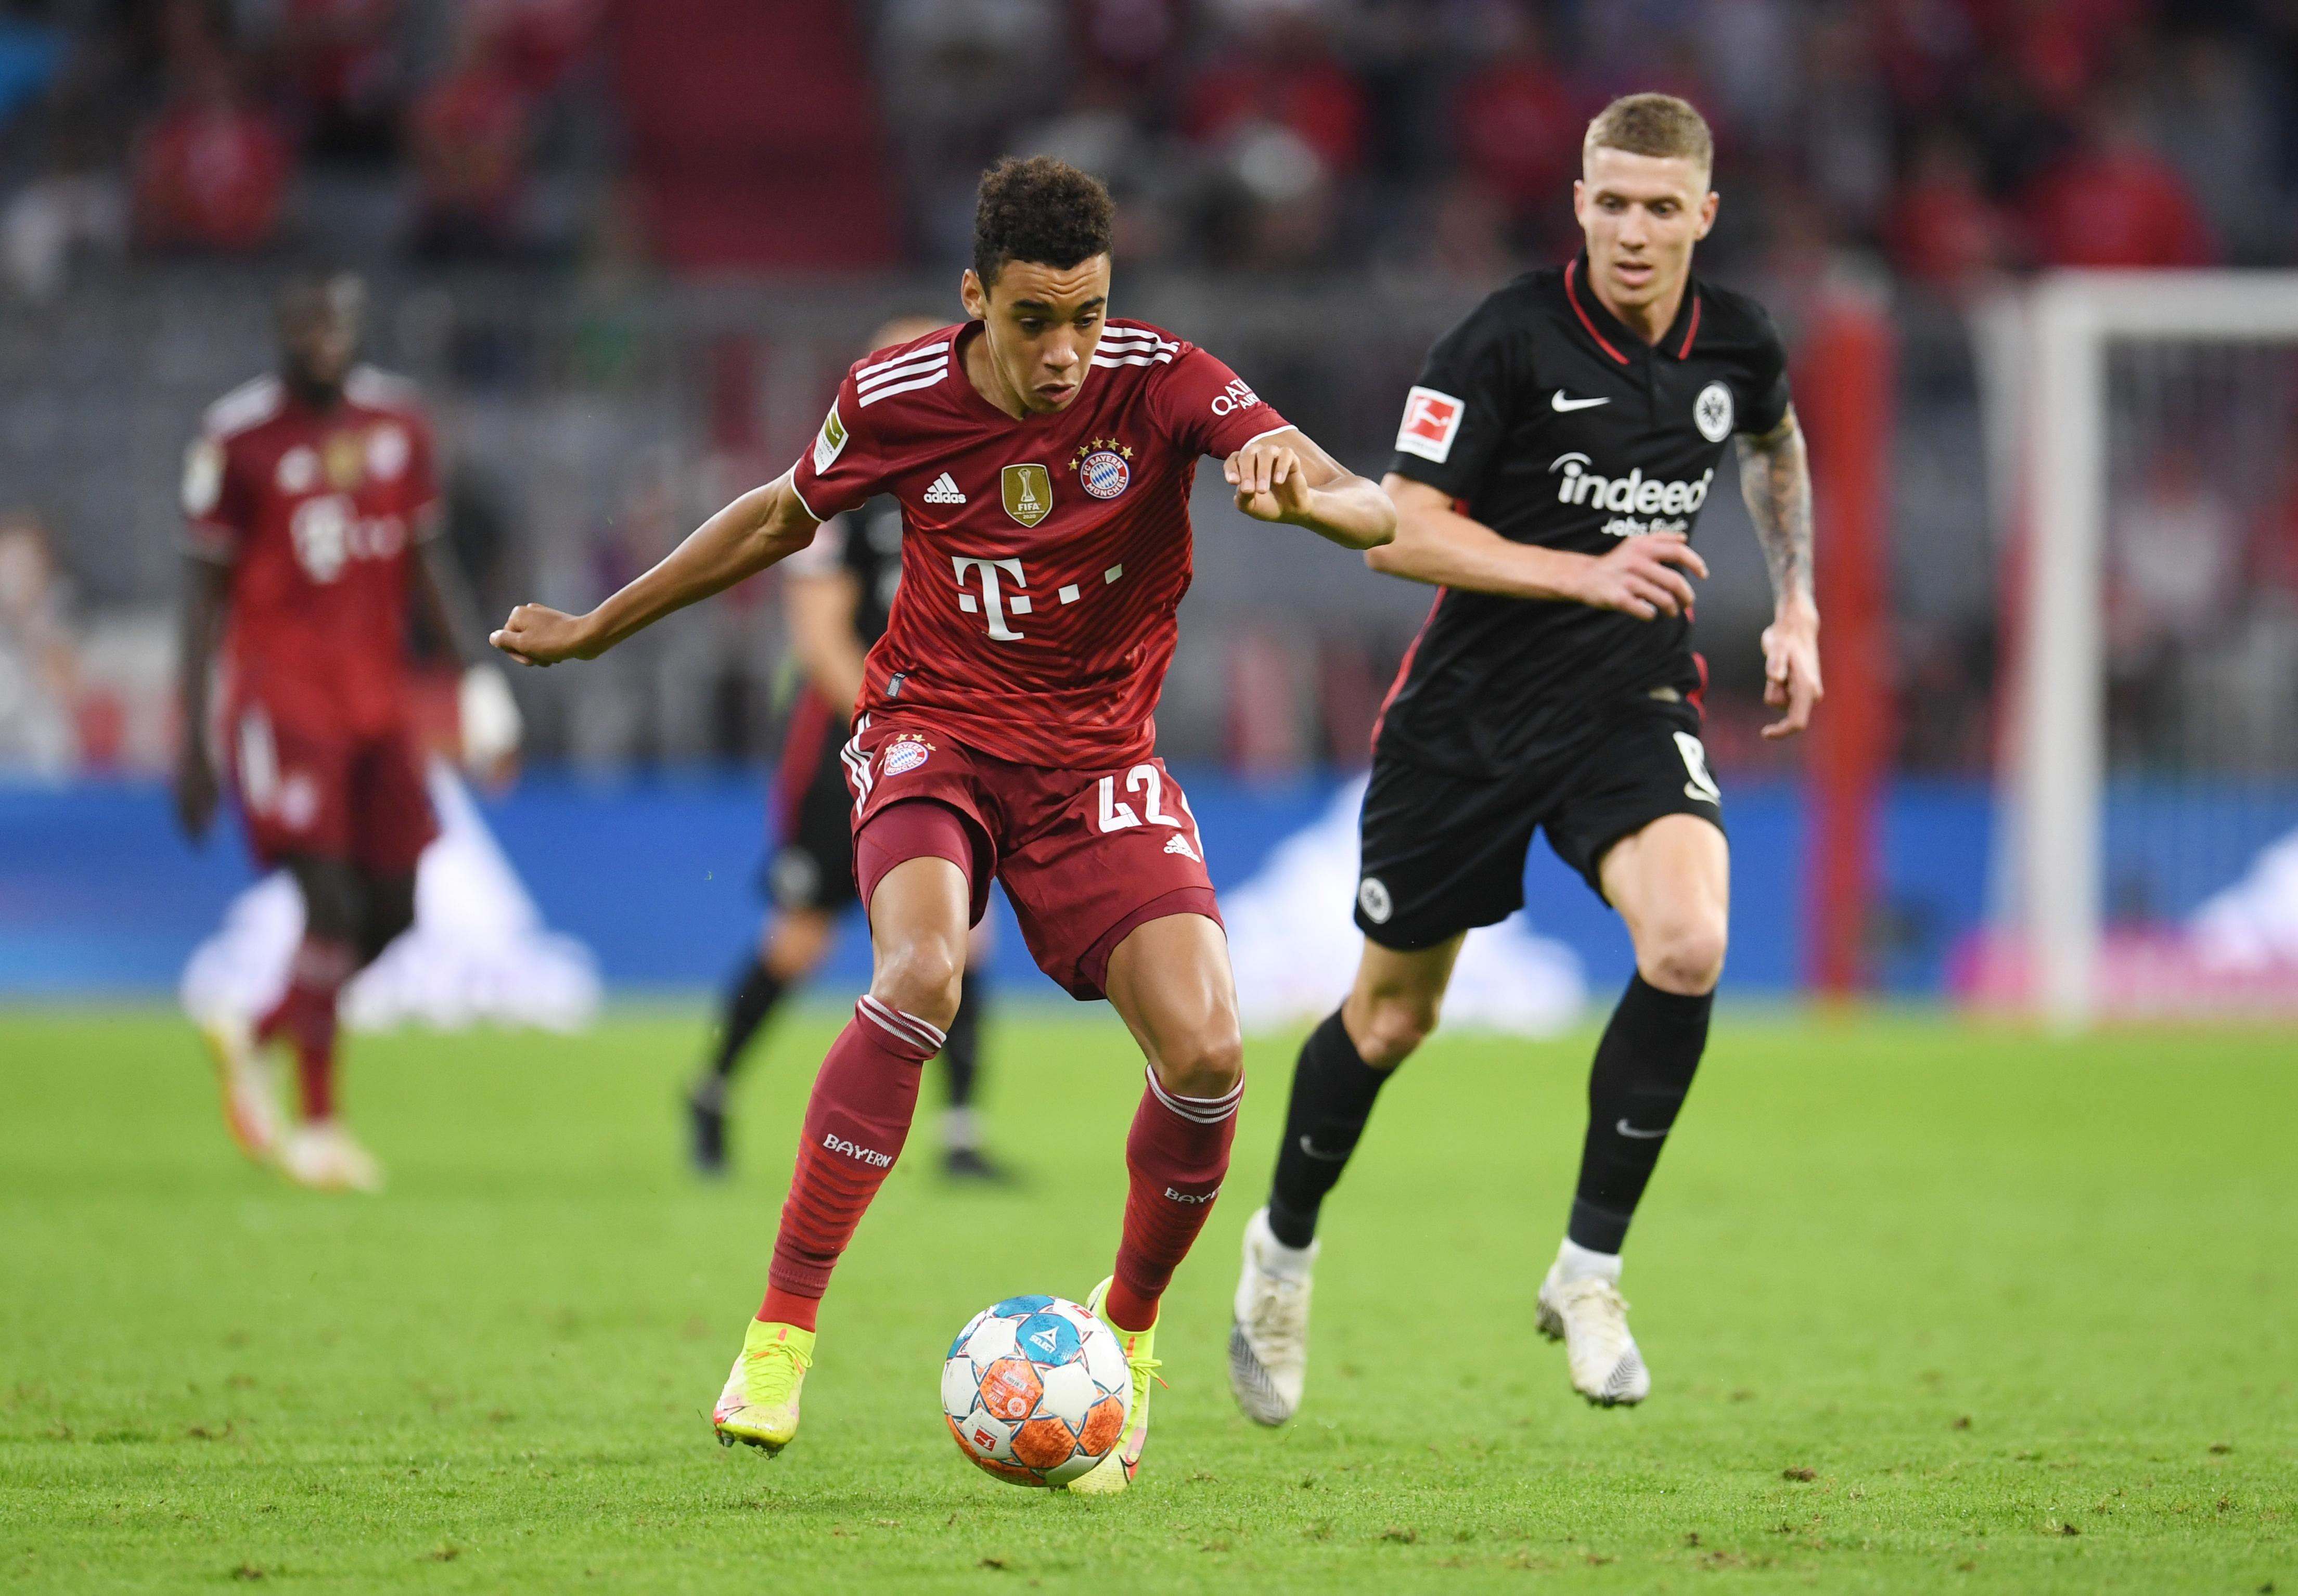 Soccer Football - Bundesliga - Bayern Munich v Eintracht Frankfurt - Allianz Arena, Munich, Germany - October 3, 2021 Bayern Munich's Jamal Musiala in action REUTERS/Andreas Gebert